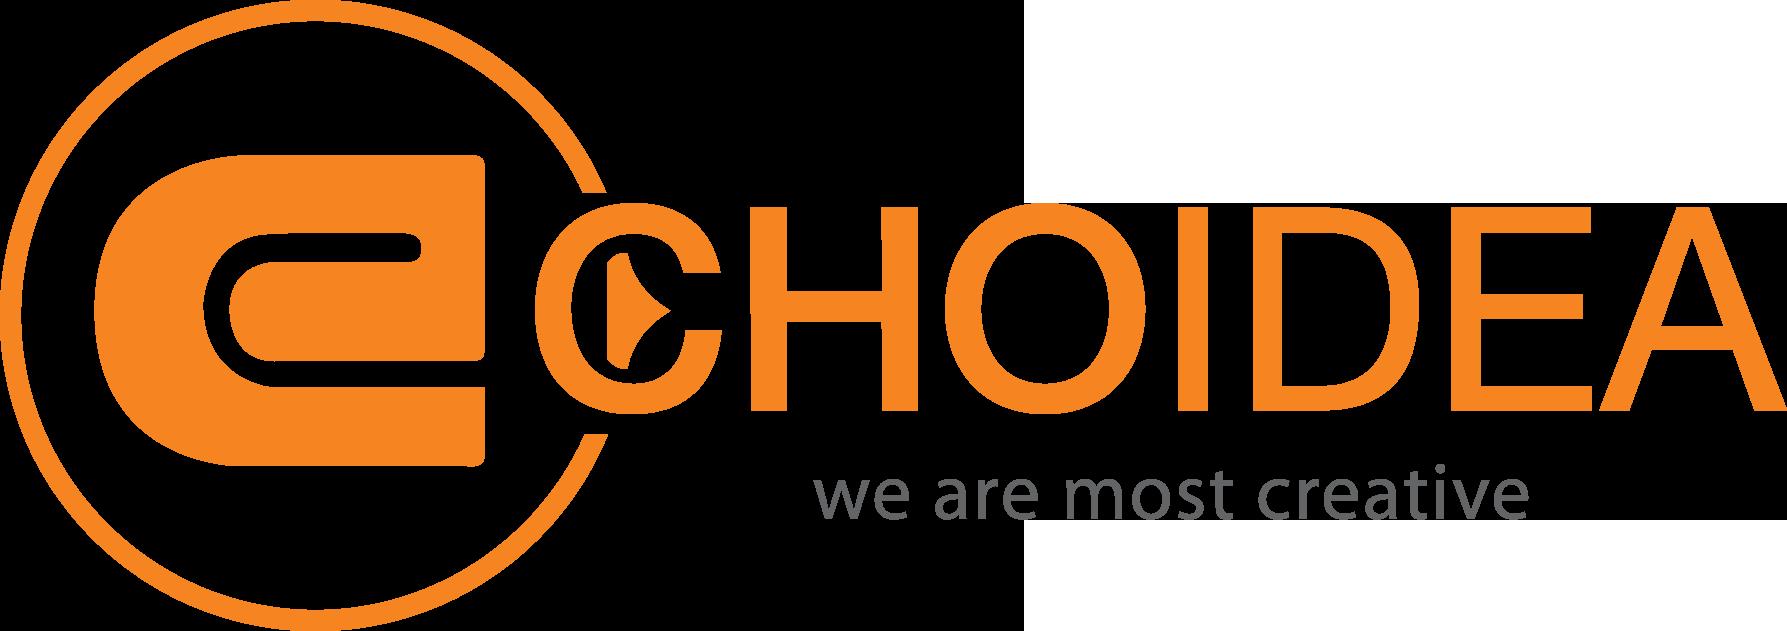 echoidea logo